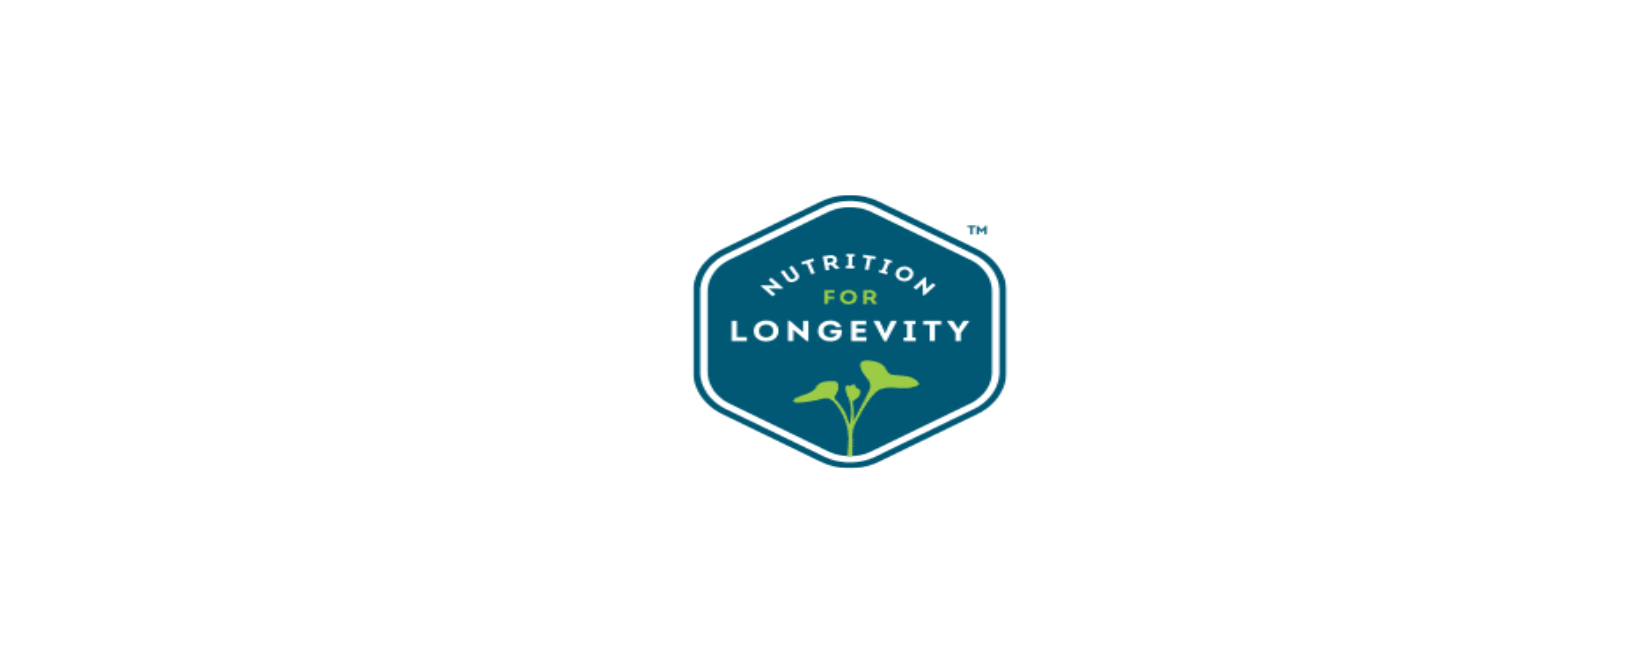 Nutrition for Longevity Discount Code 2021